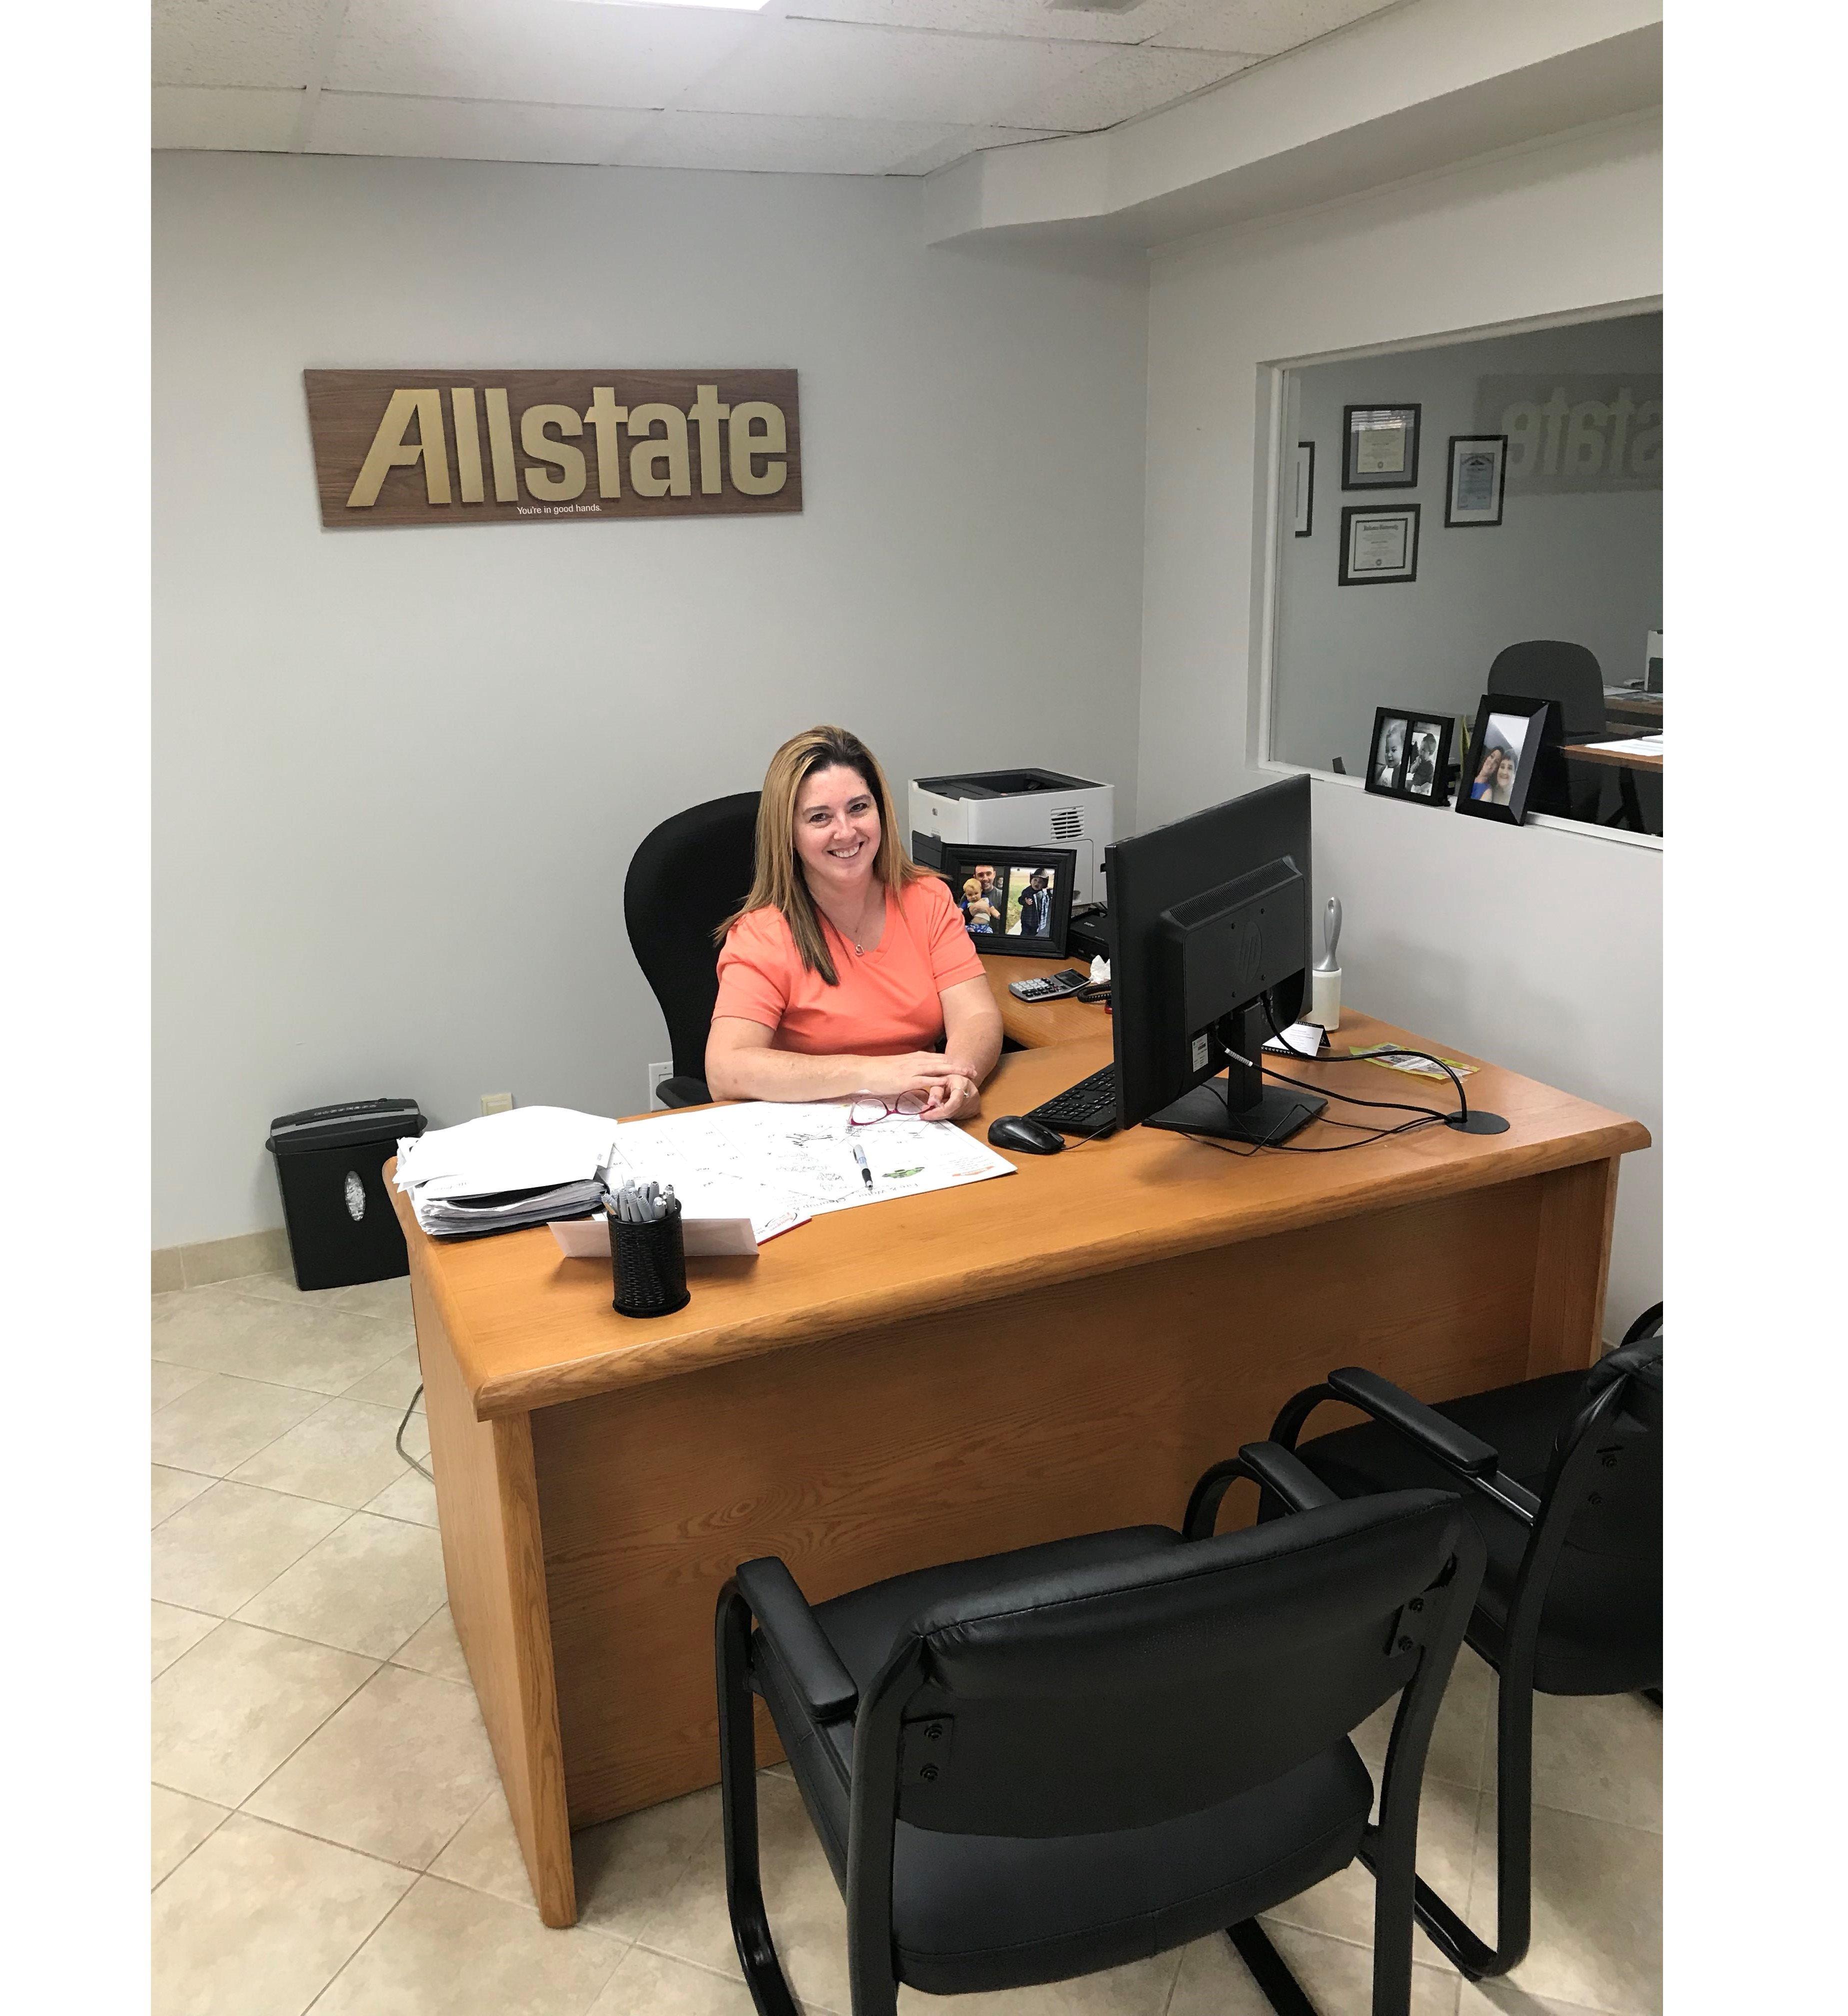 John Coffman Jr: Allstate Insurance image 2